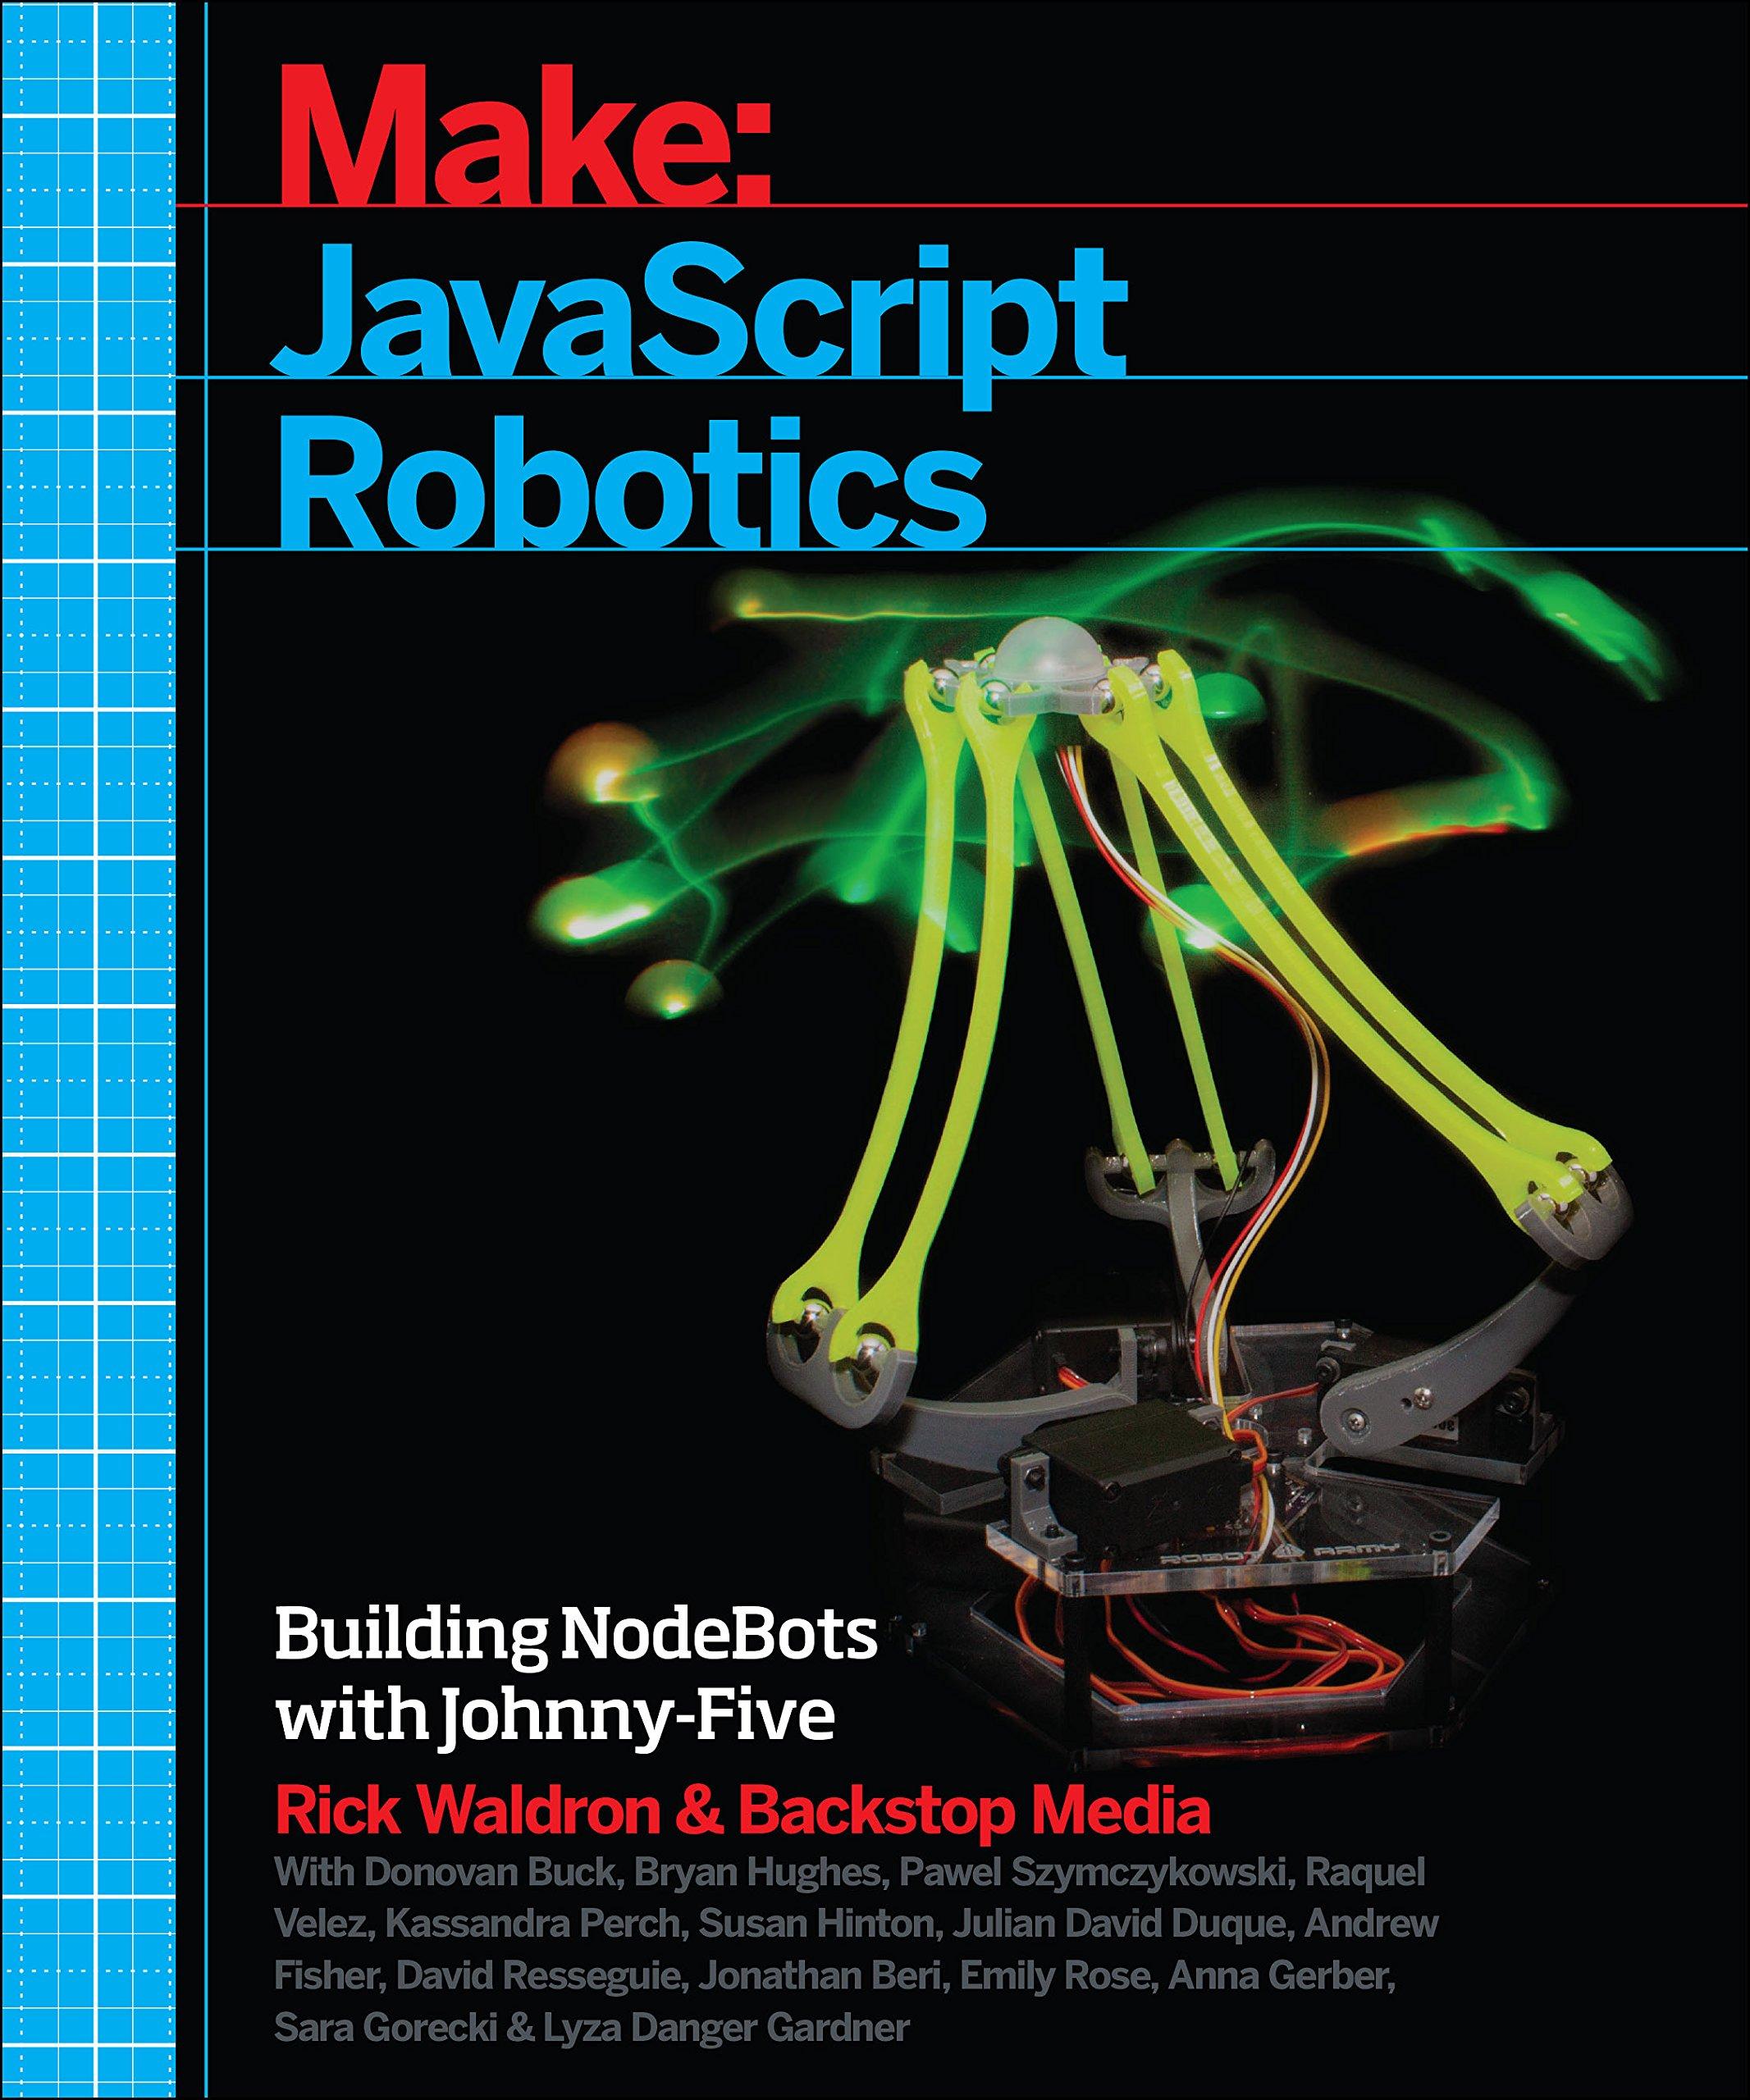 Johnny Five Npm Raspberry Pi Hc Sr04 Wiringpi Make Javascript Robotics